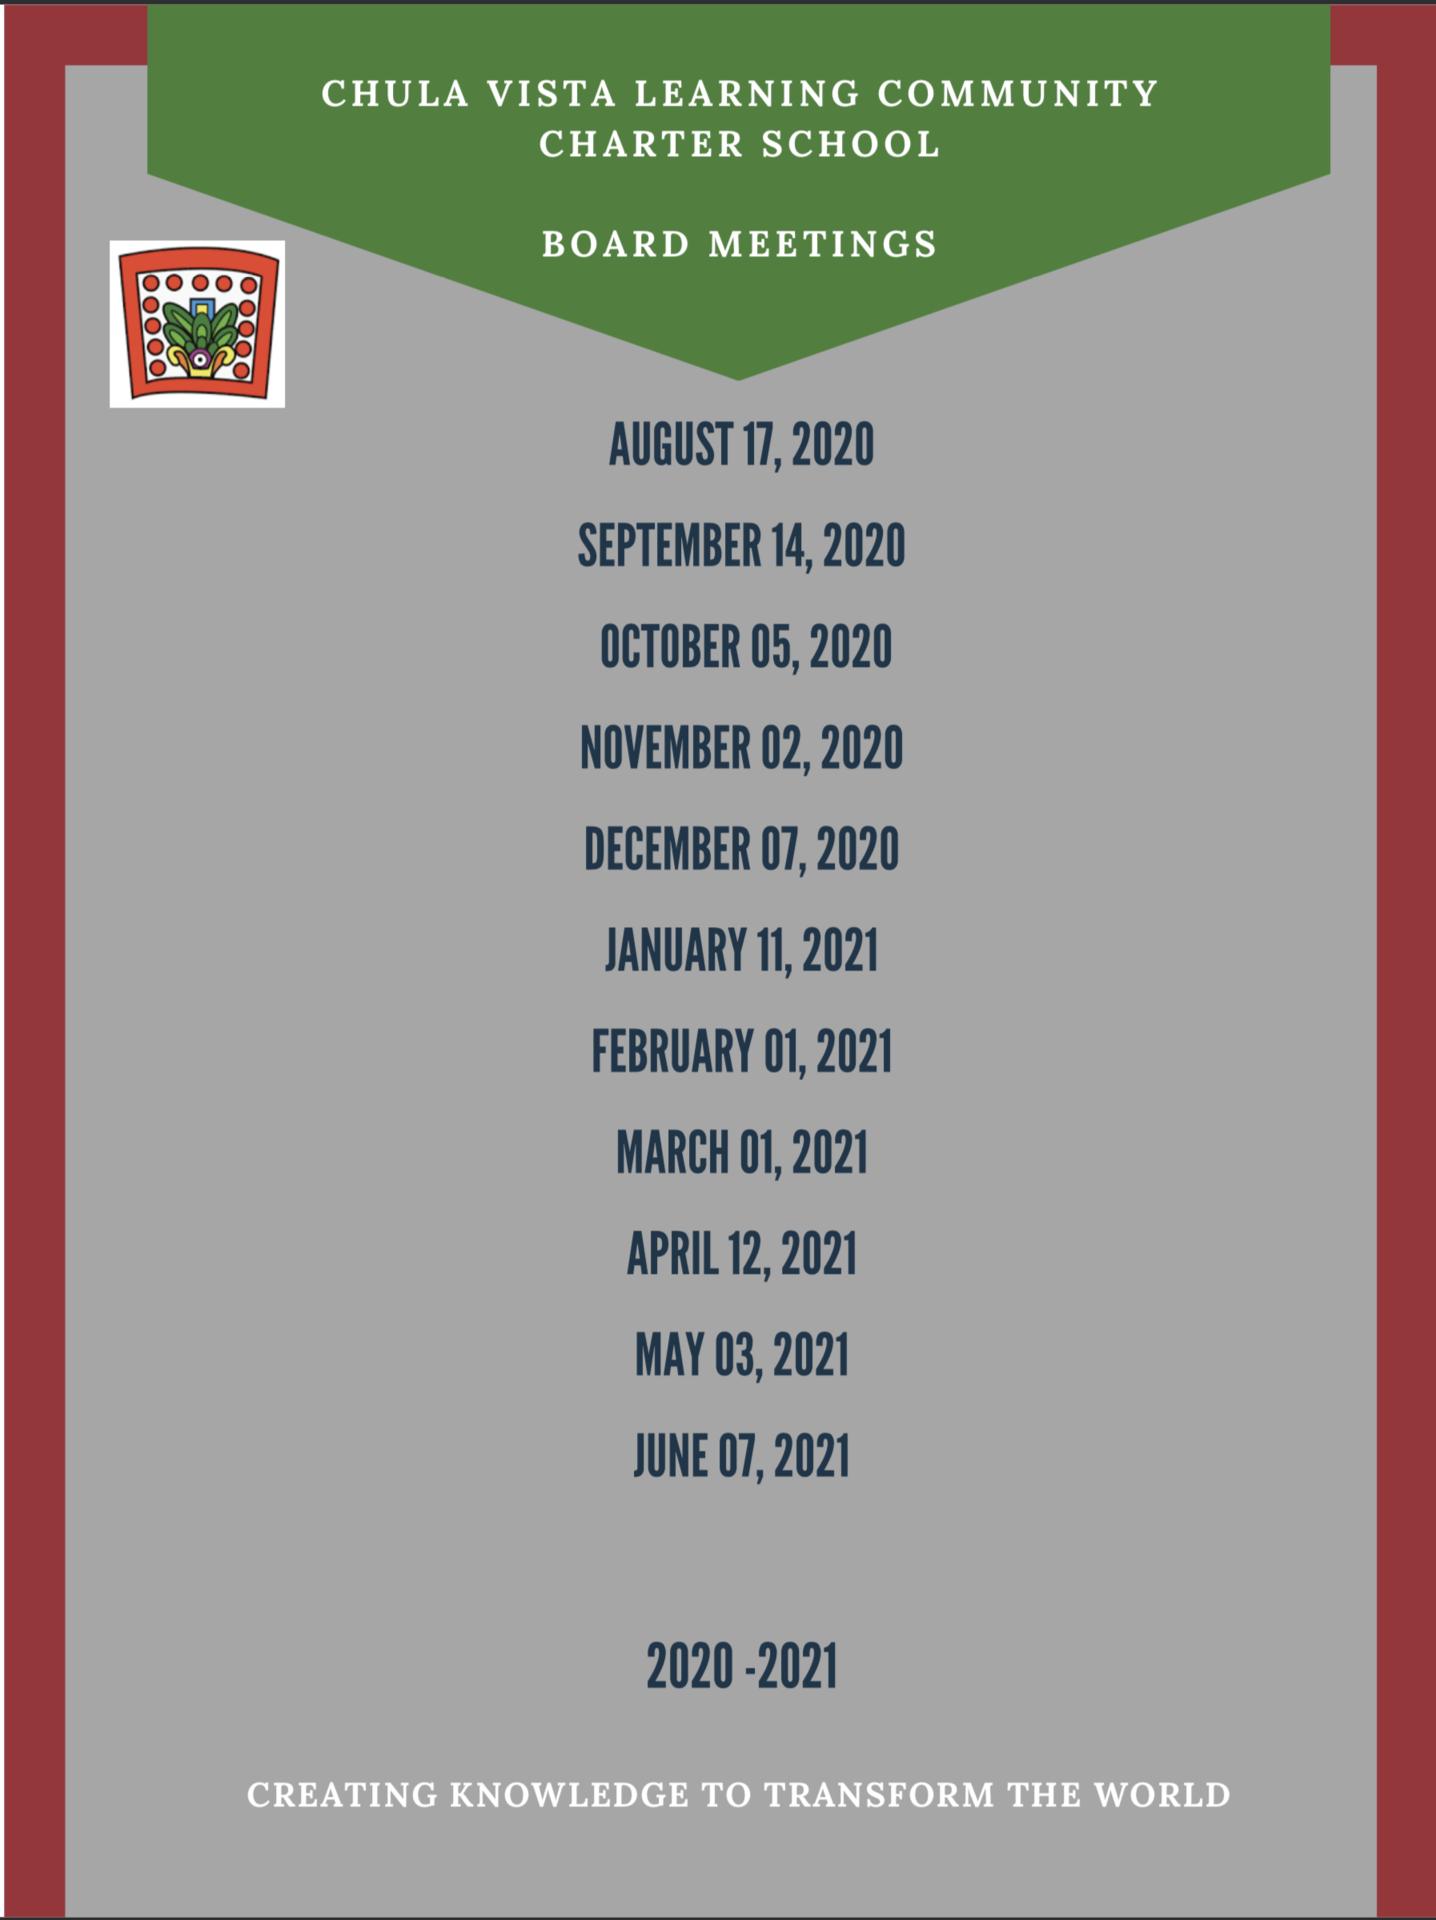 Board Meeting Dates